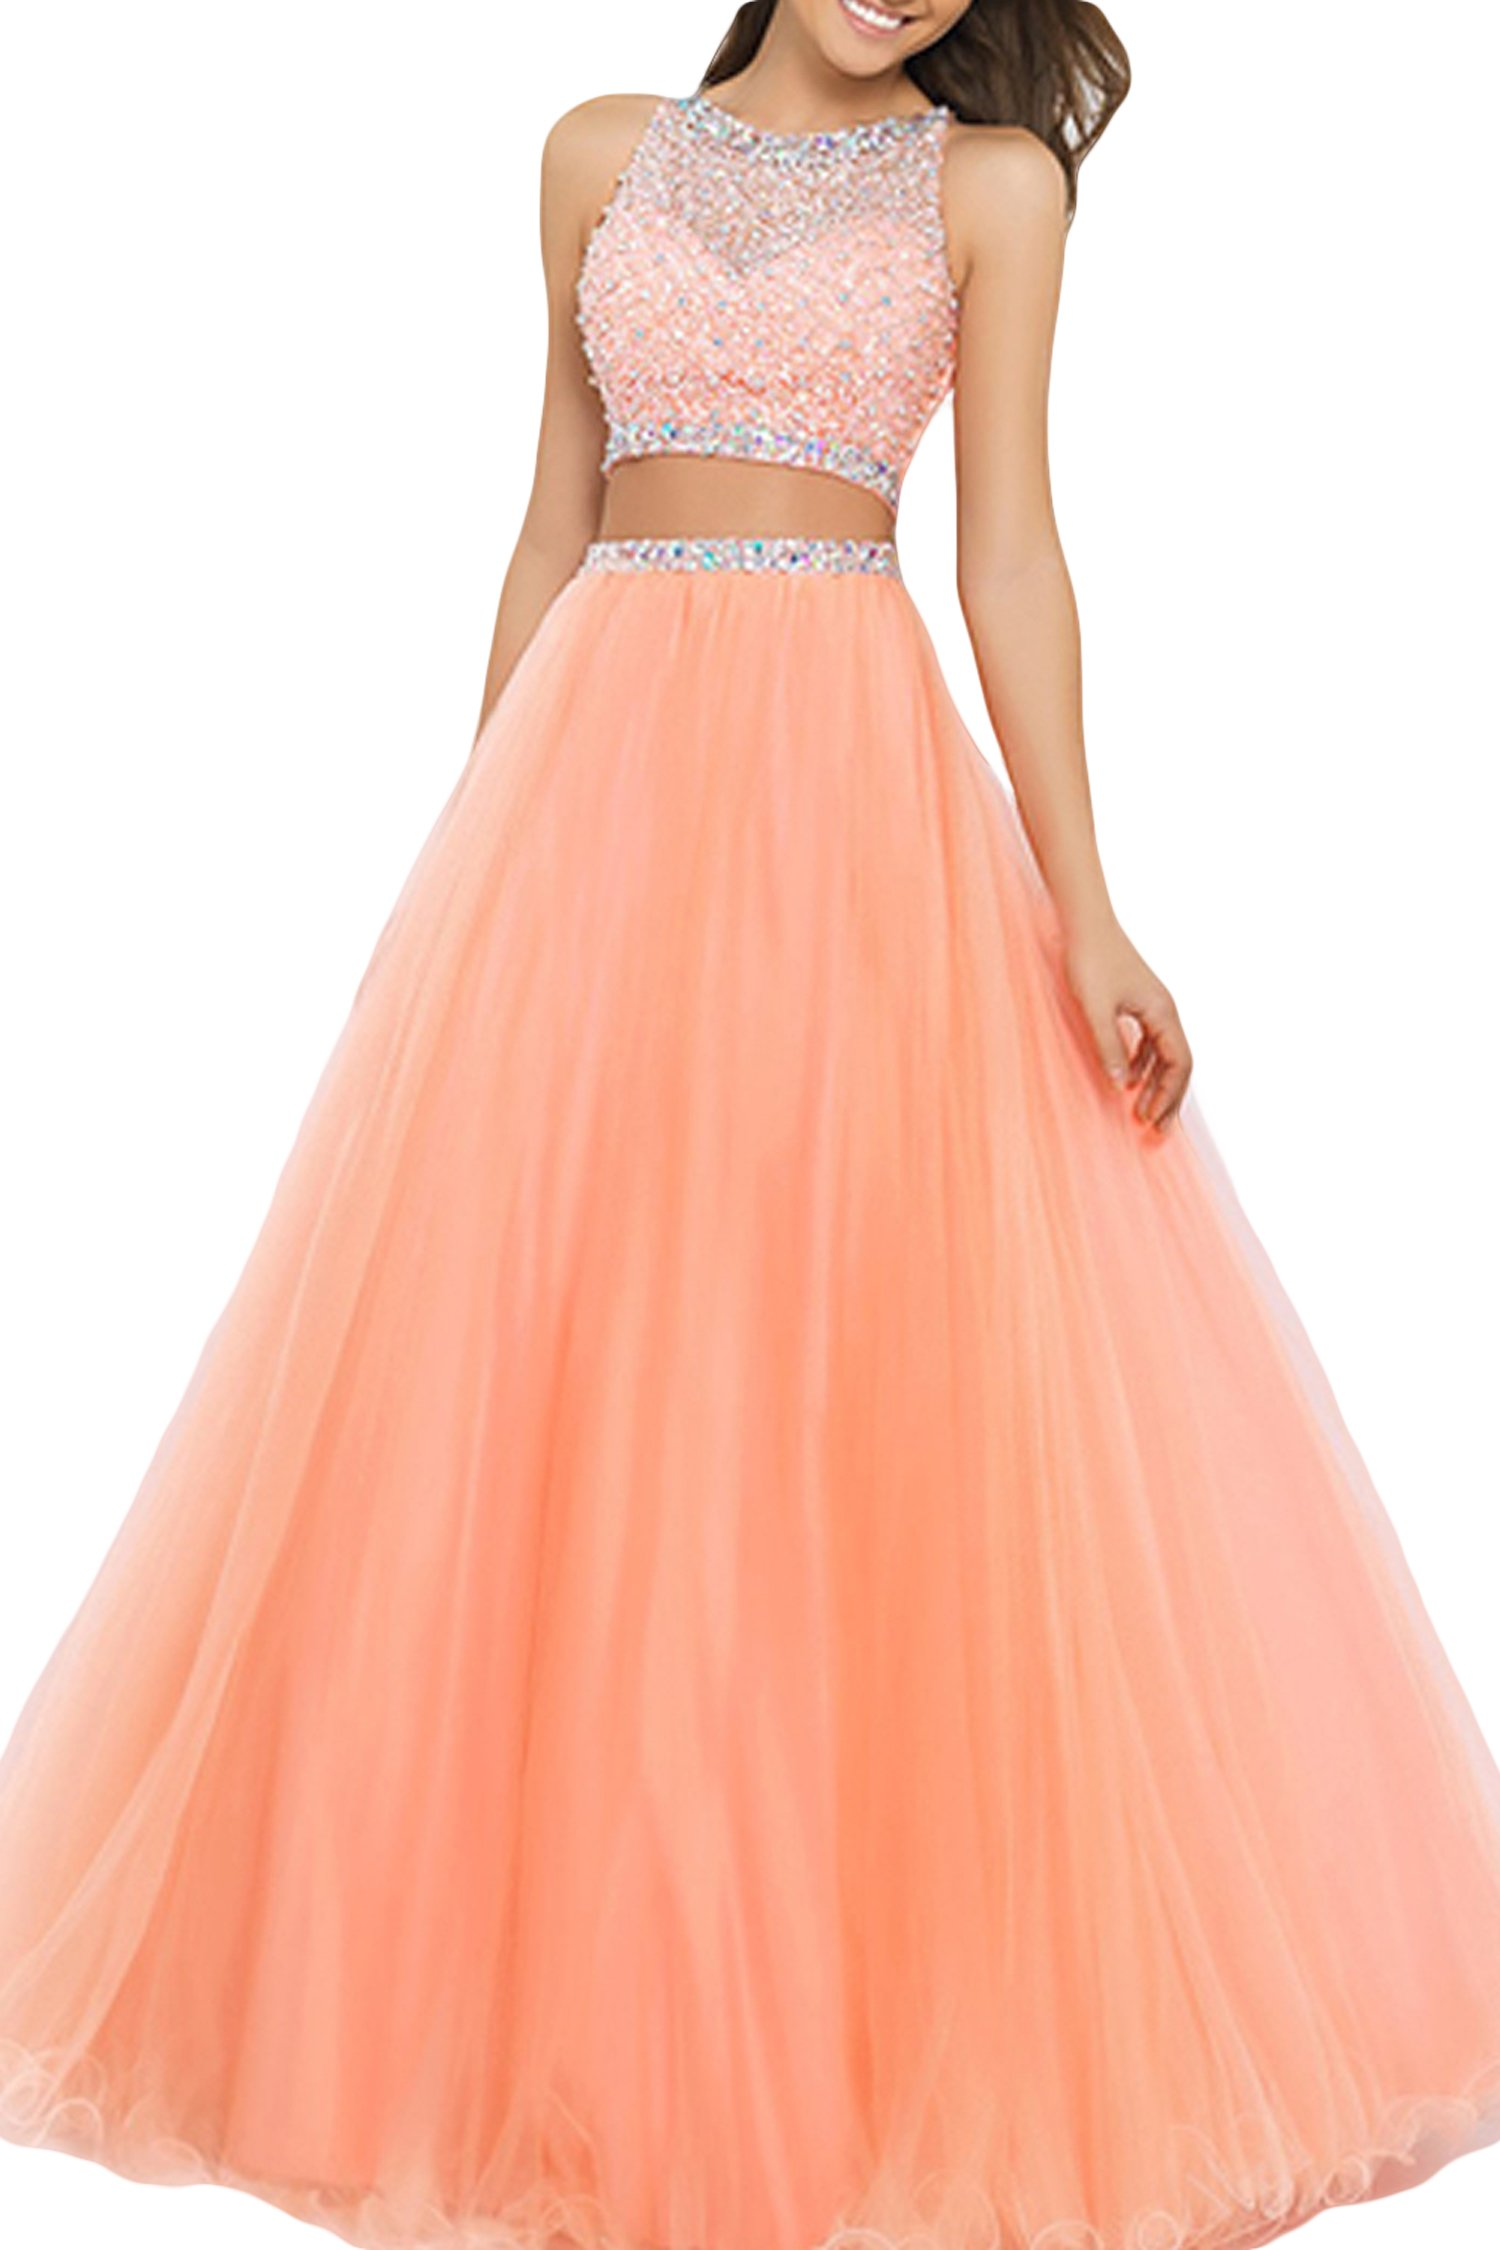 SeasonMall Women's Prom Dress Two Pieces Bateau Beaded Bodice Tulle Dresses Size 6 US Orange